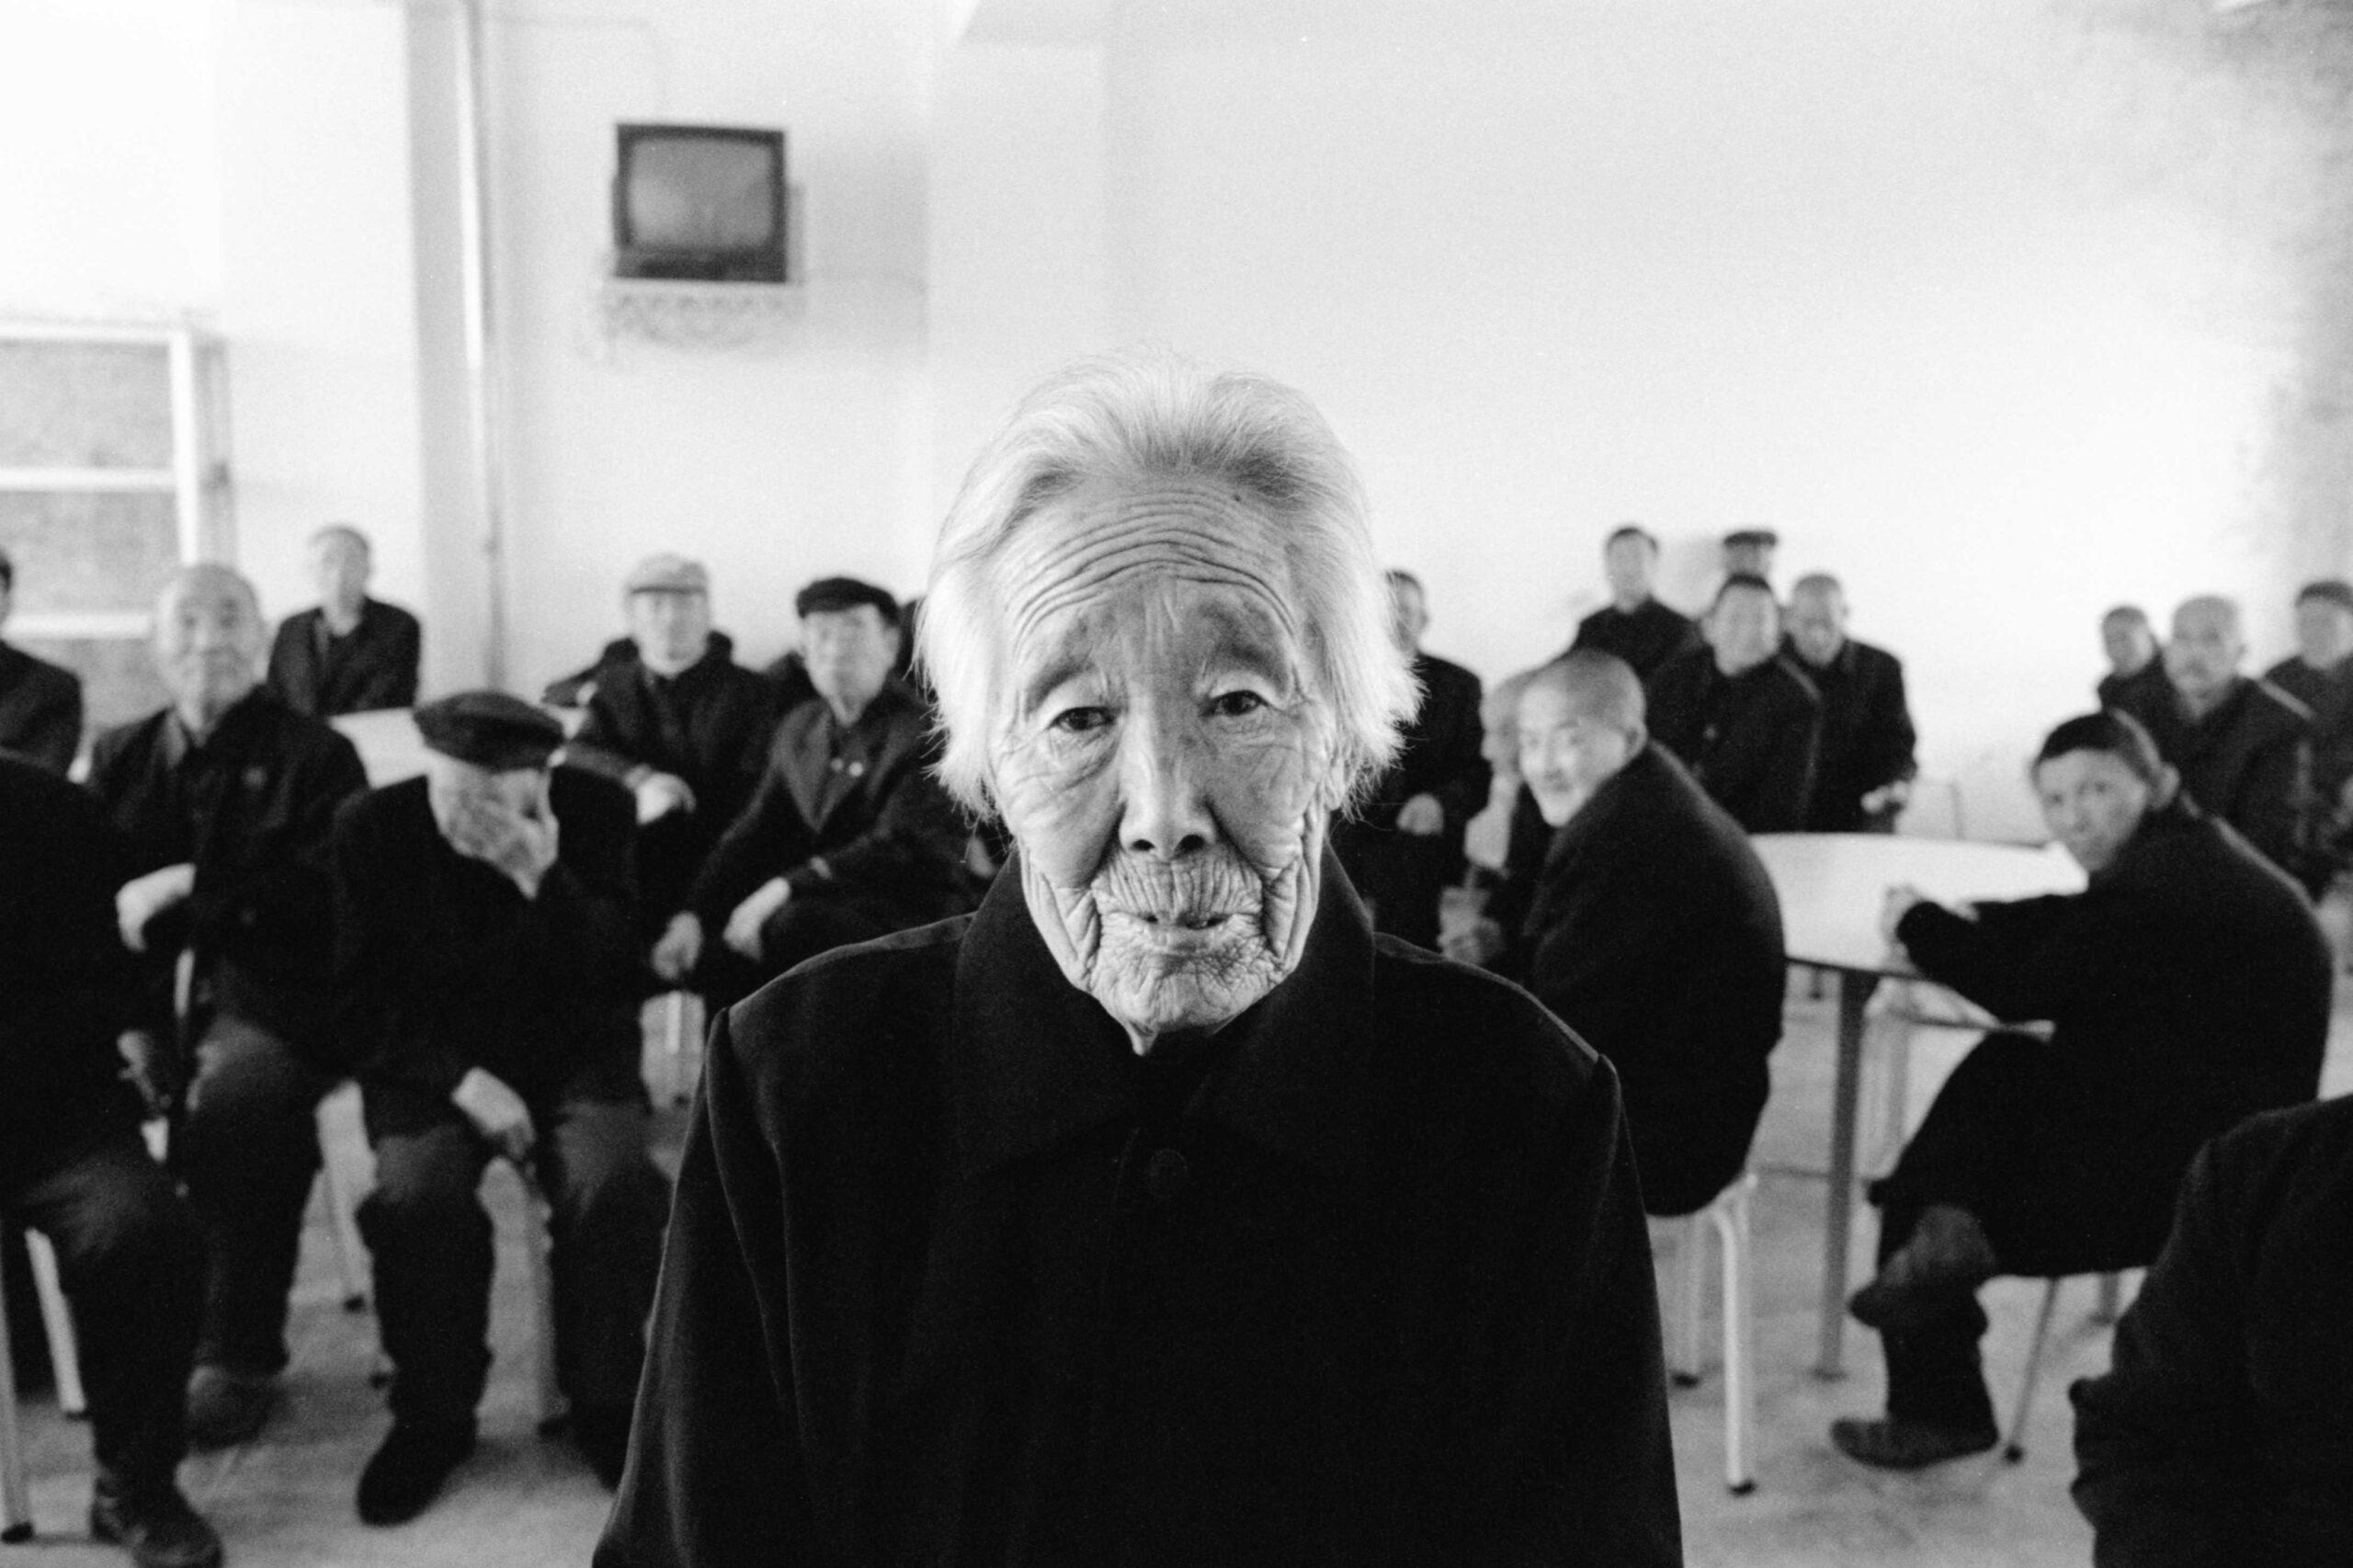 09 lee su-dan in a nursing home in dongnin 2005-009